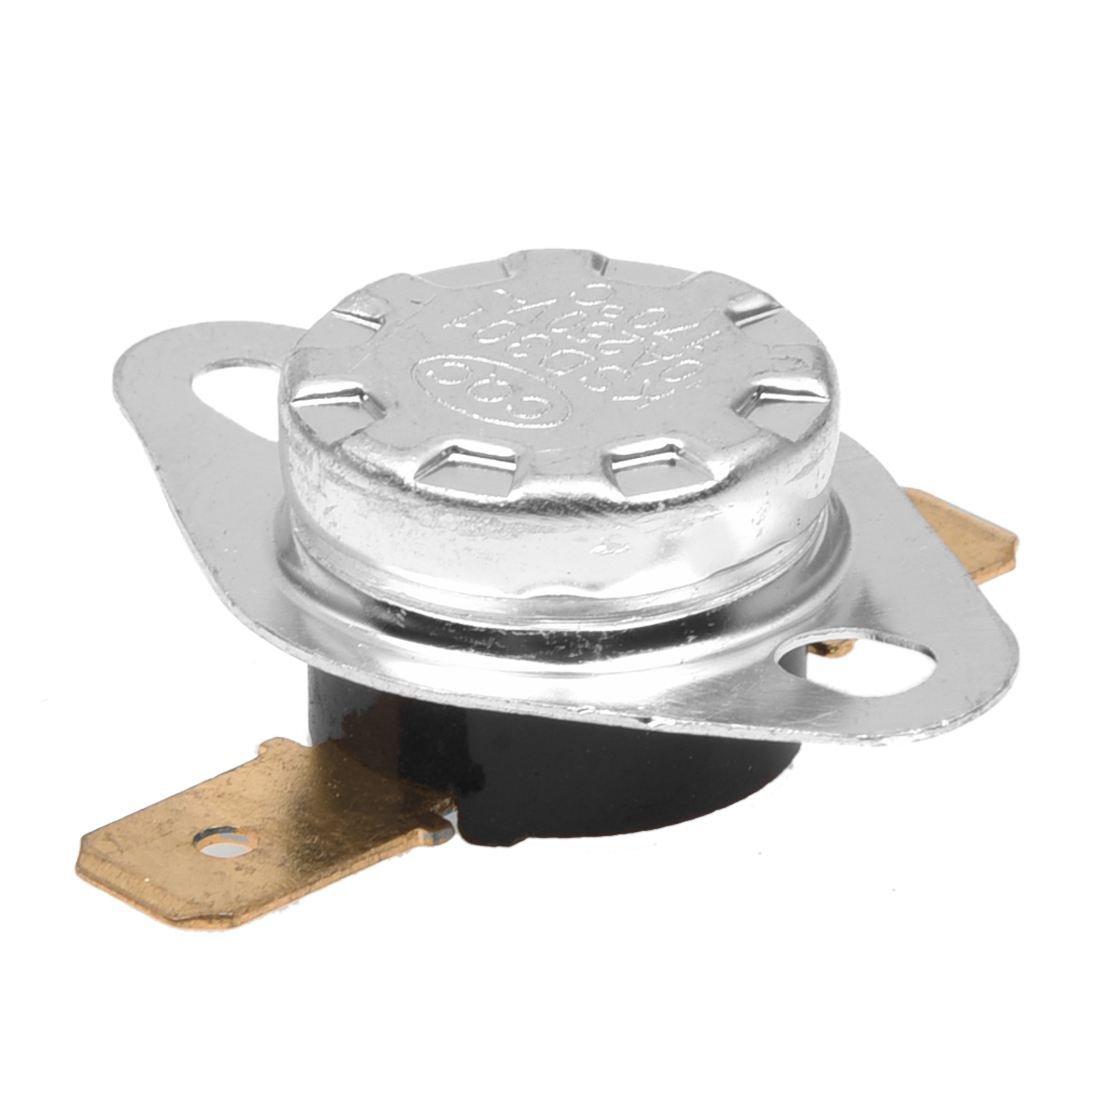 SODIAL(R) AC 250V 10A 170 Celsius NC Temperature Controlled Thermostat KSD301 2 Pcs